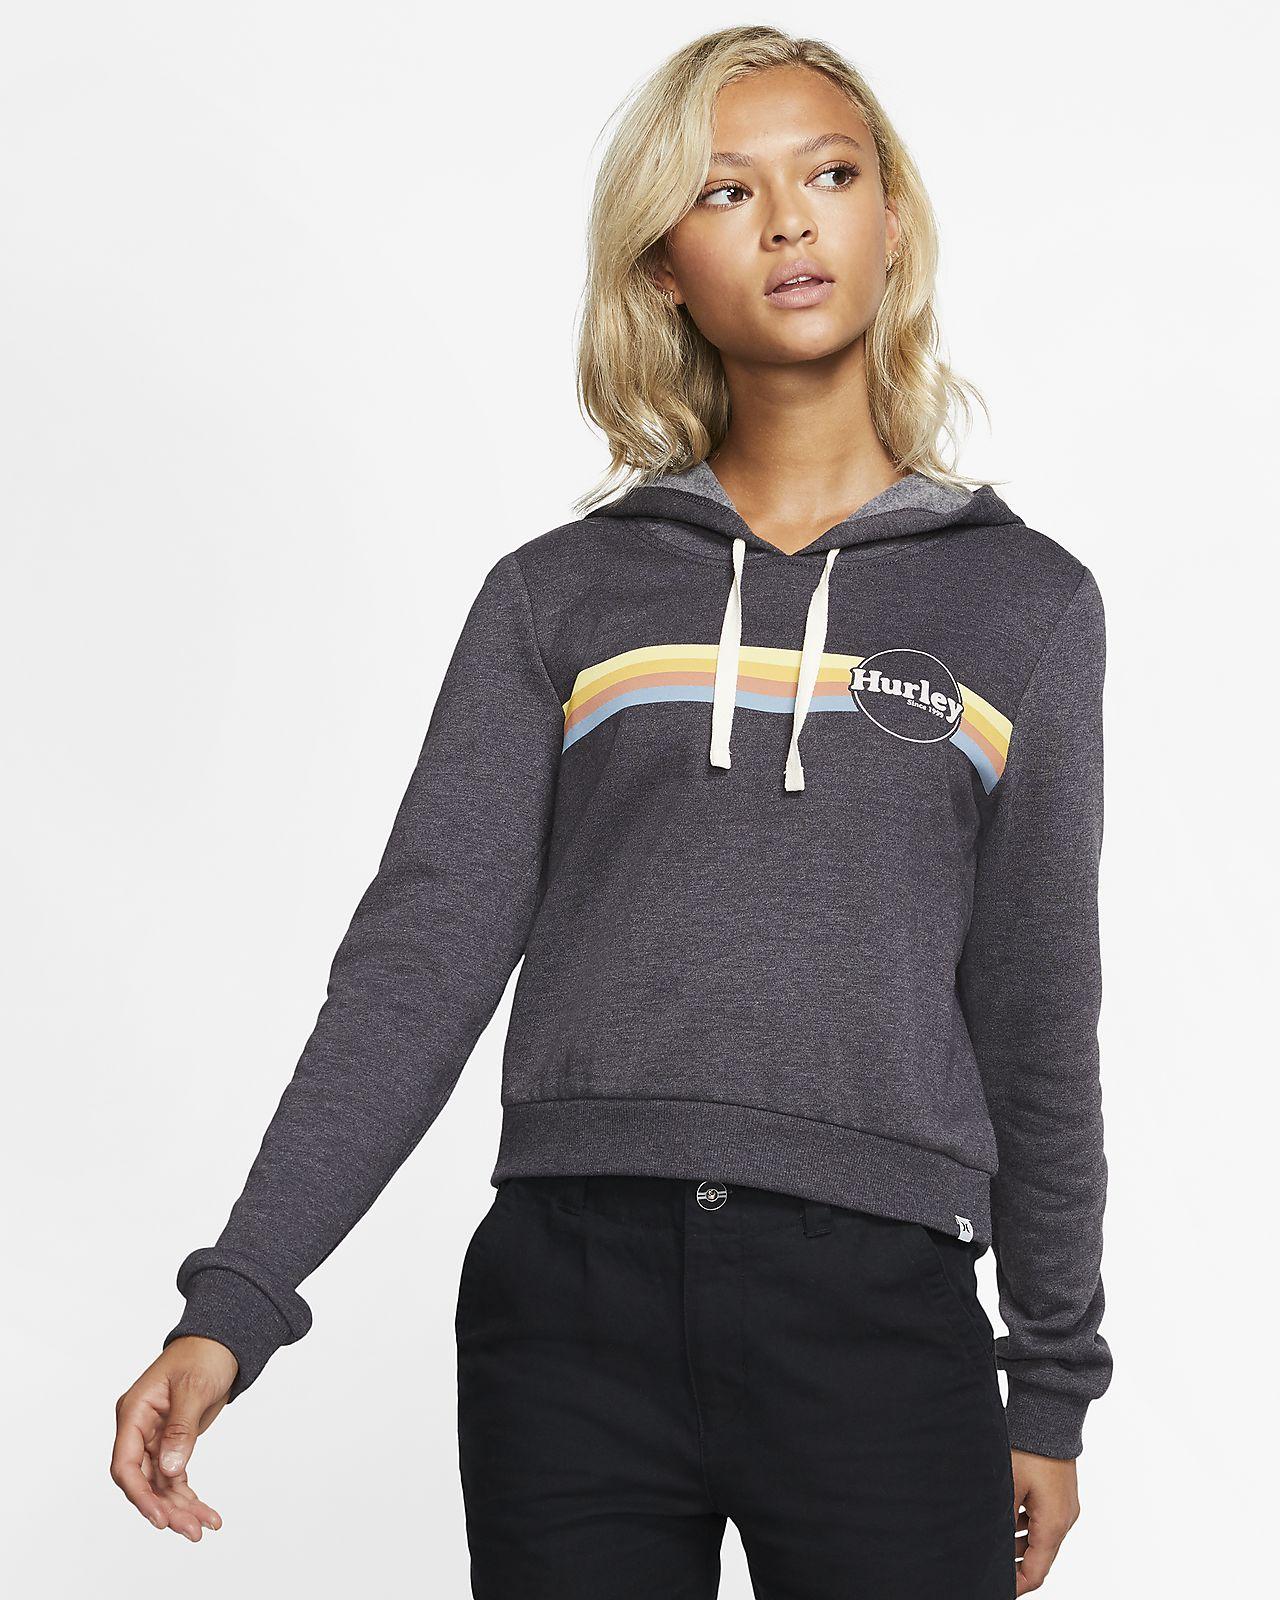 Hurley Jammer Stripe Perfect Women's Cropped Fleece Sweatshirt